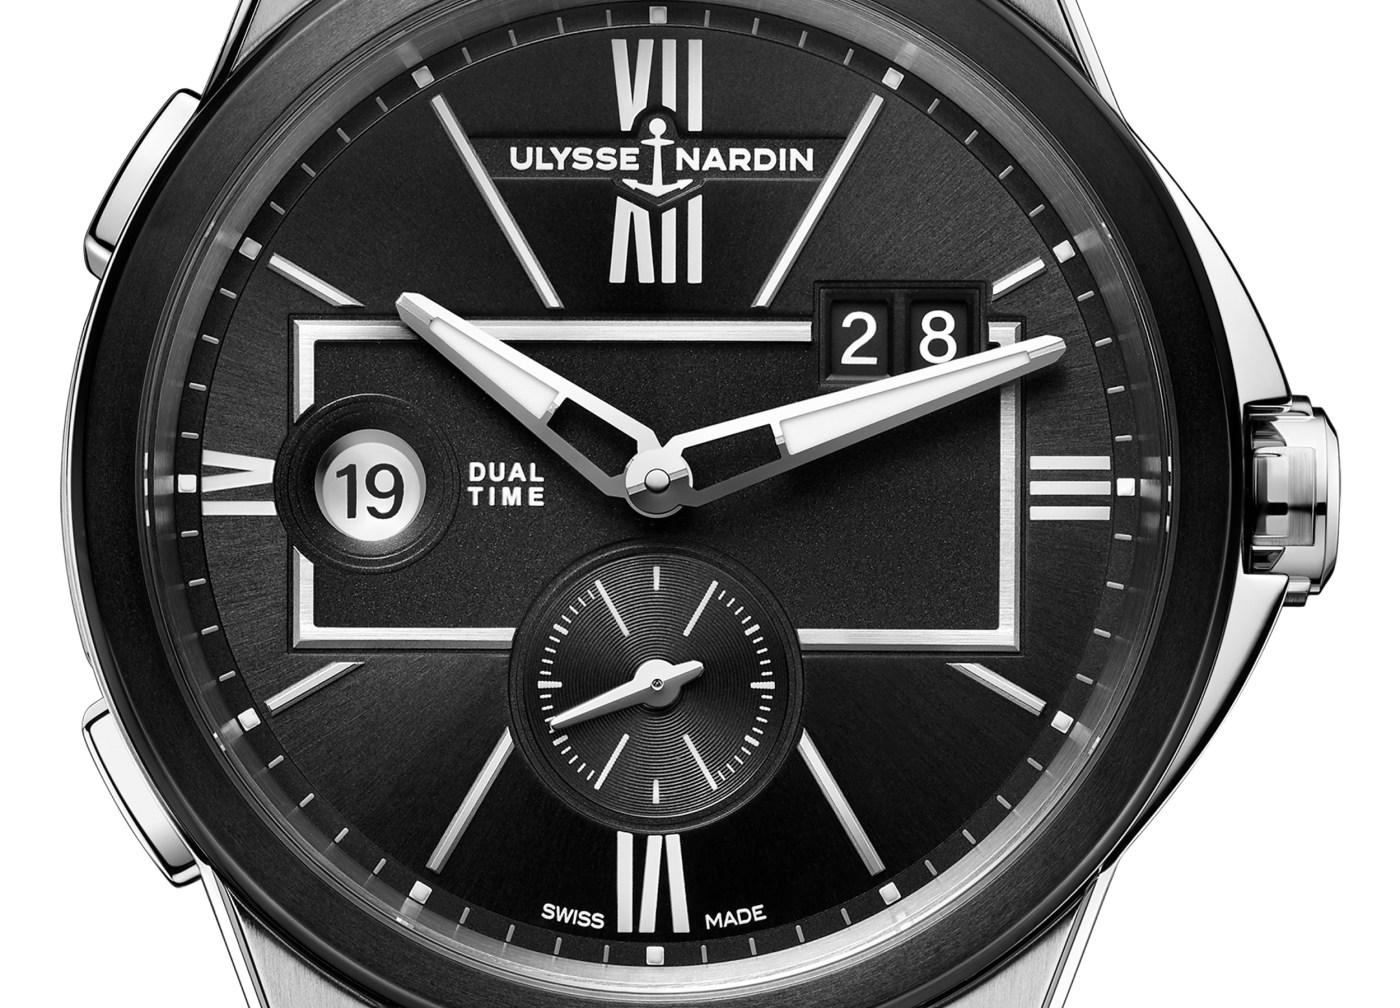 2020 Ulysse Nardin Dual Time dial close-up